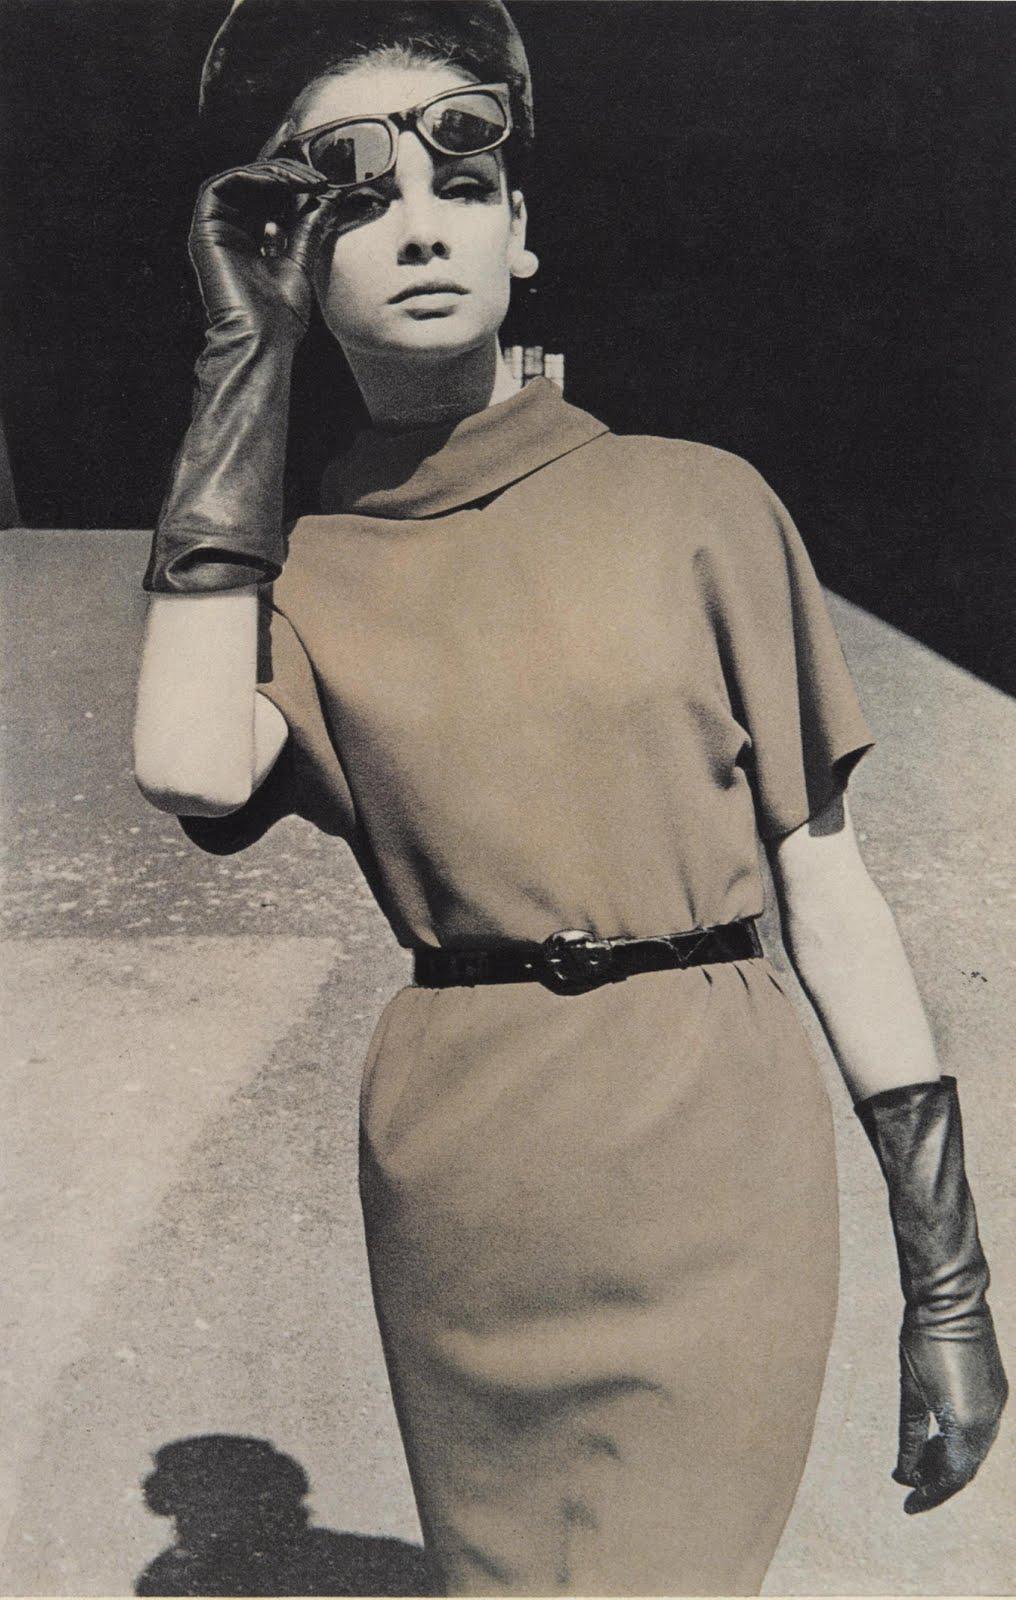 Andrew Sullivan - Archive - NYMag Celebrity spring fashion wars